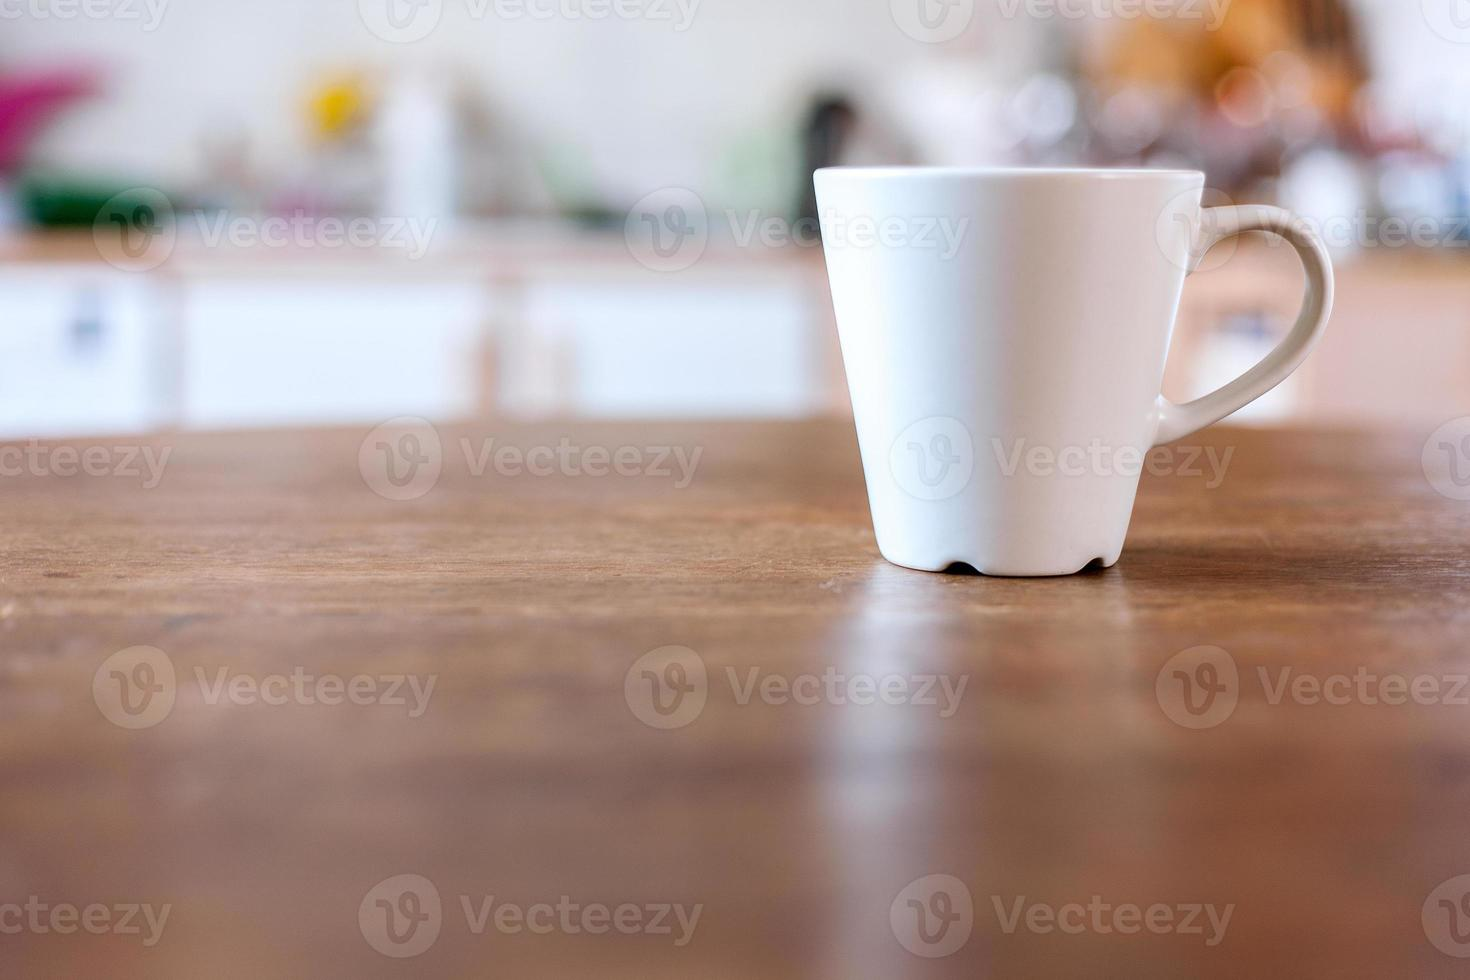 kopje koffie met vintage keuken intreepupil achtergrond. foto